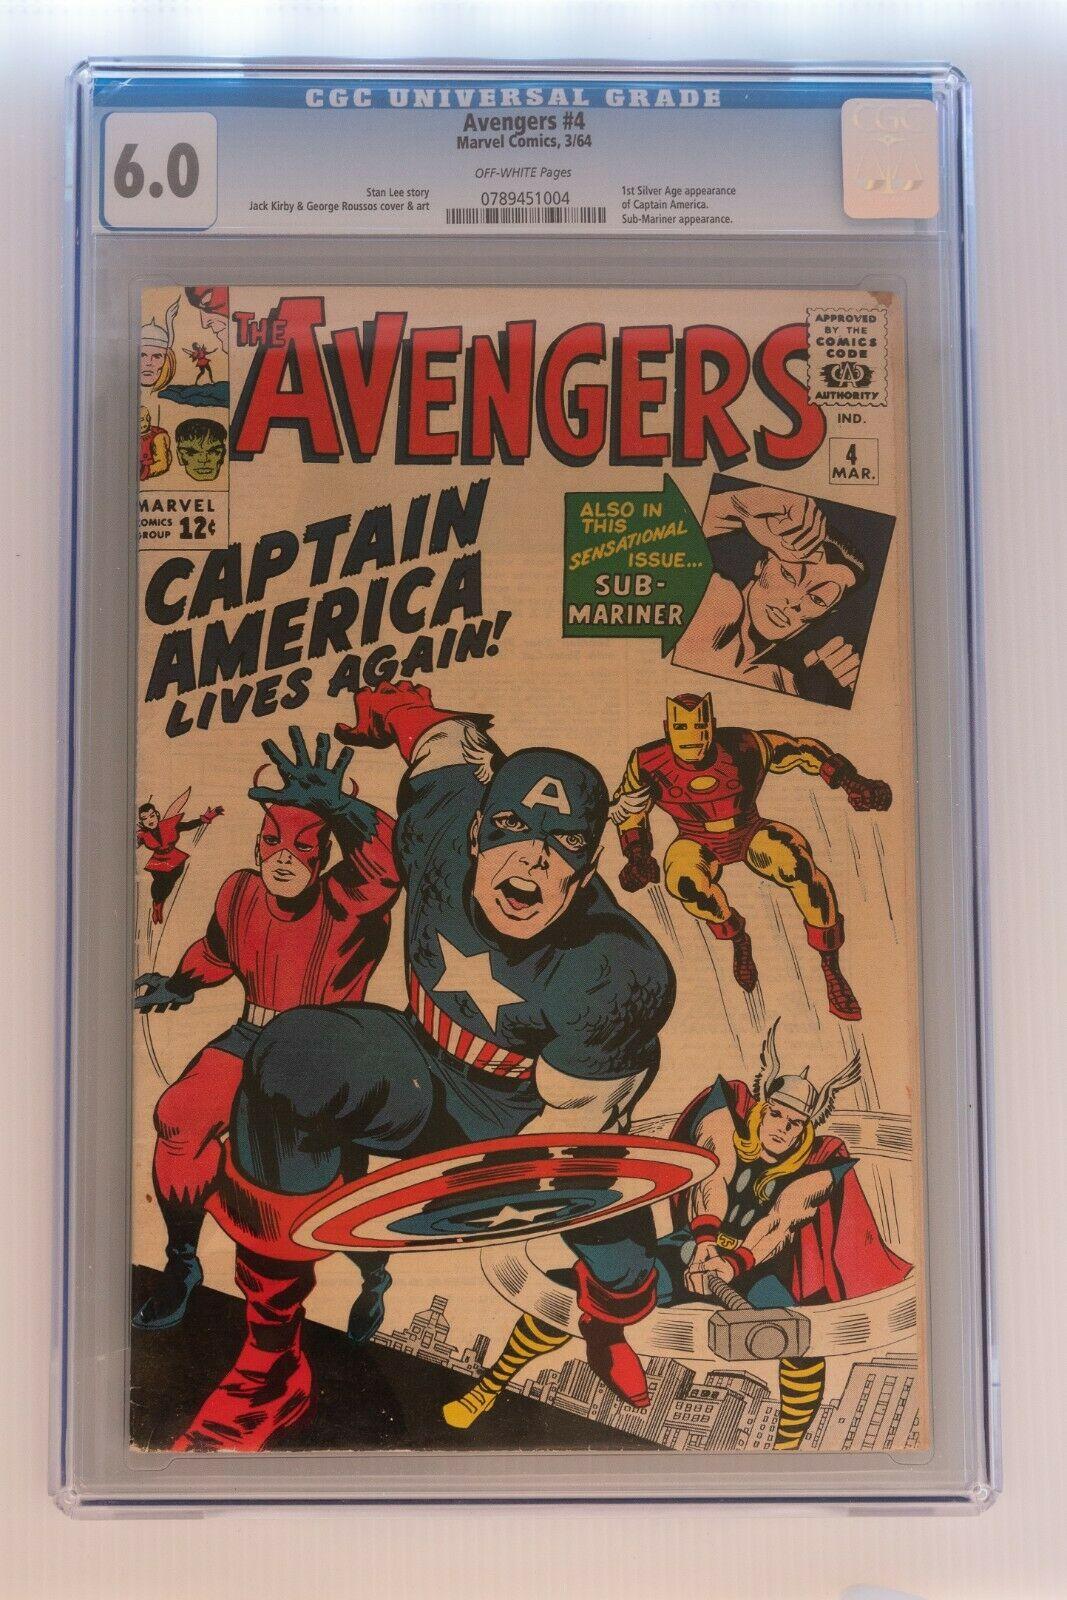 Avengers Issue 4  60 CGC Grade